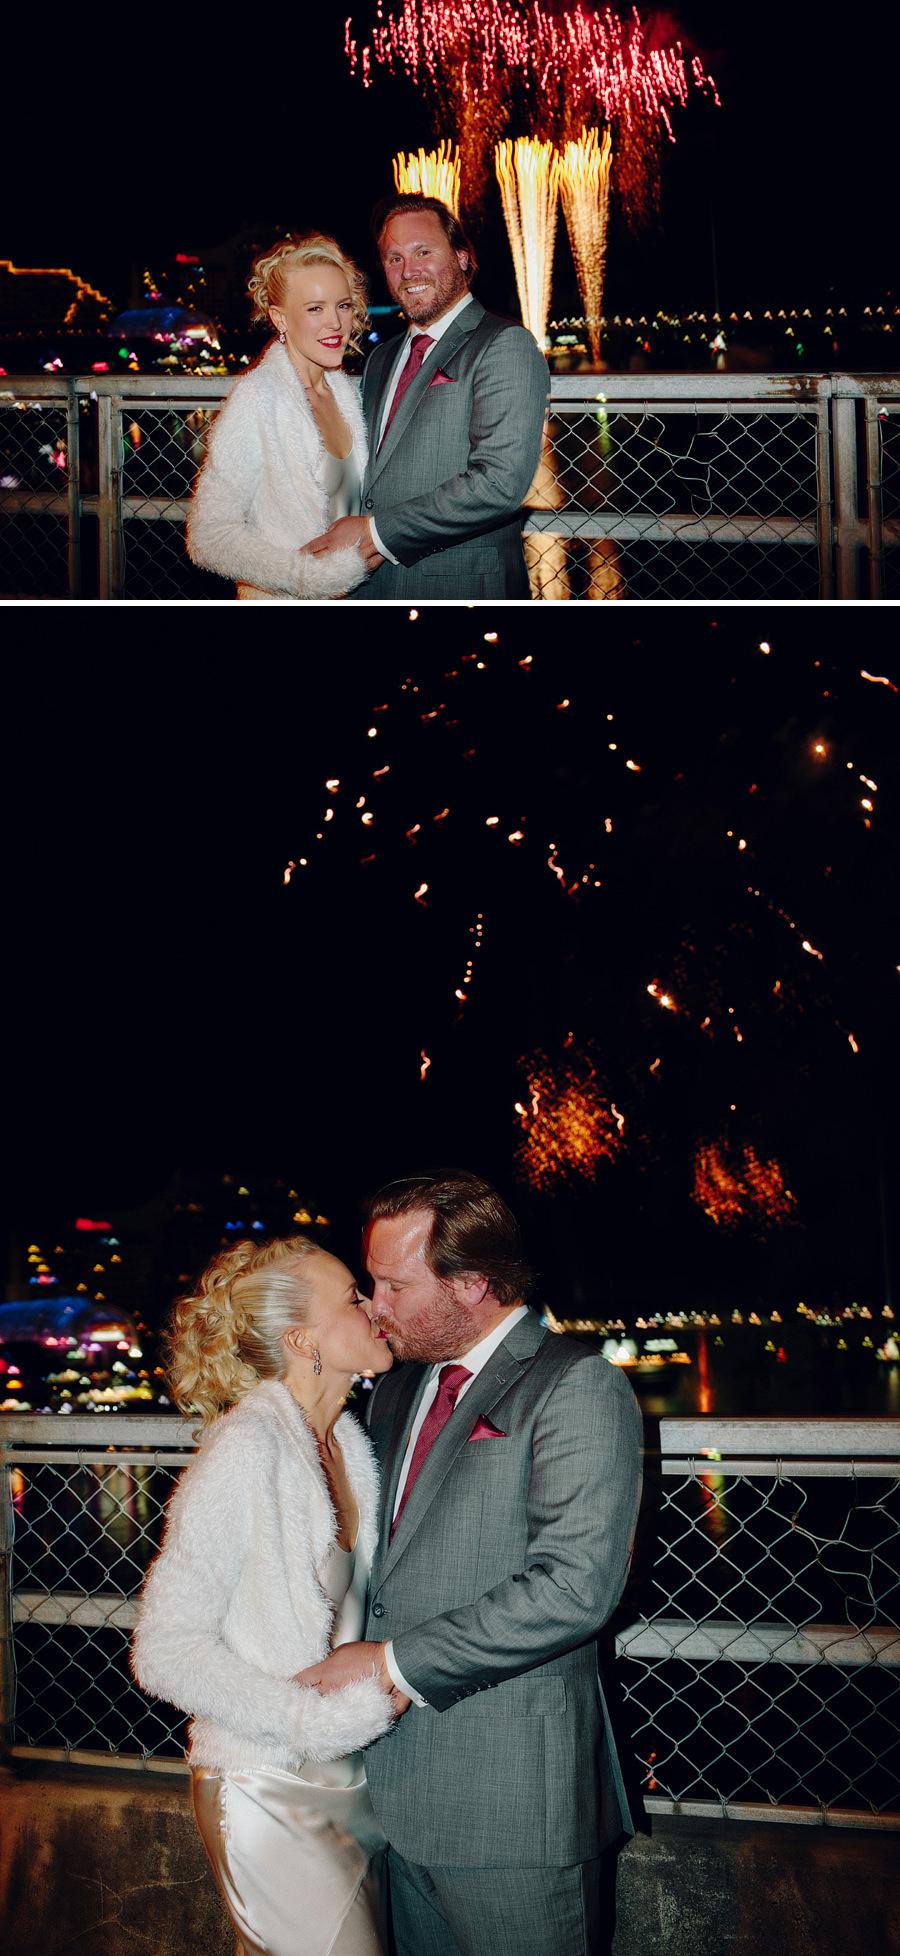 Darling Harbour Wedding Photographer: Night Portraits